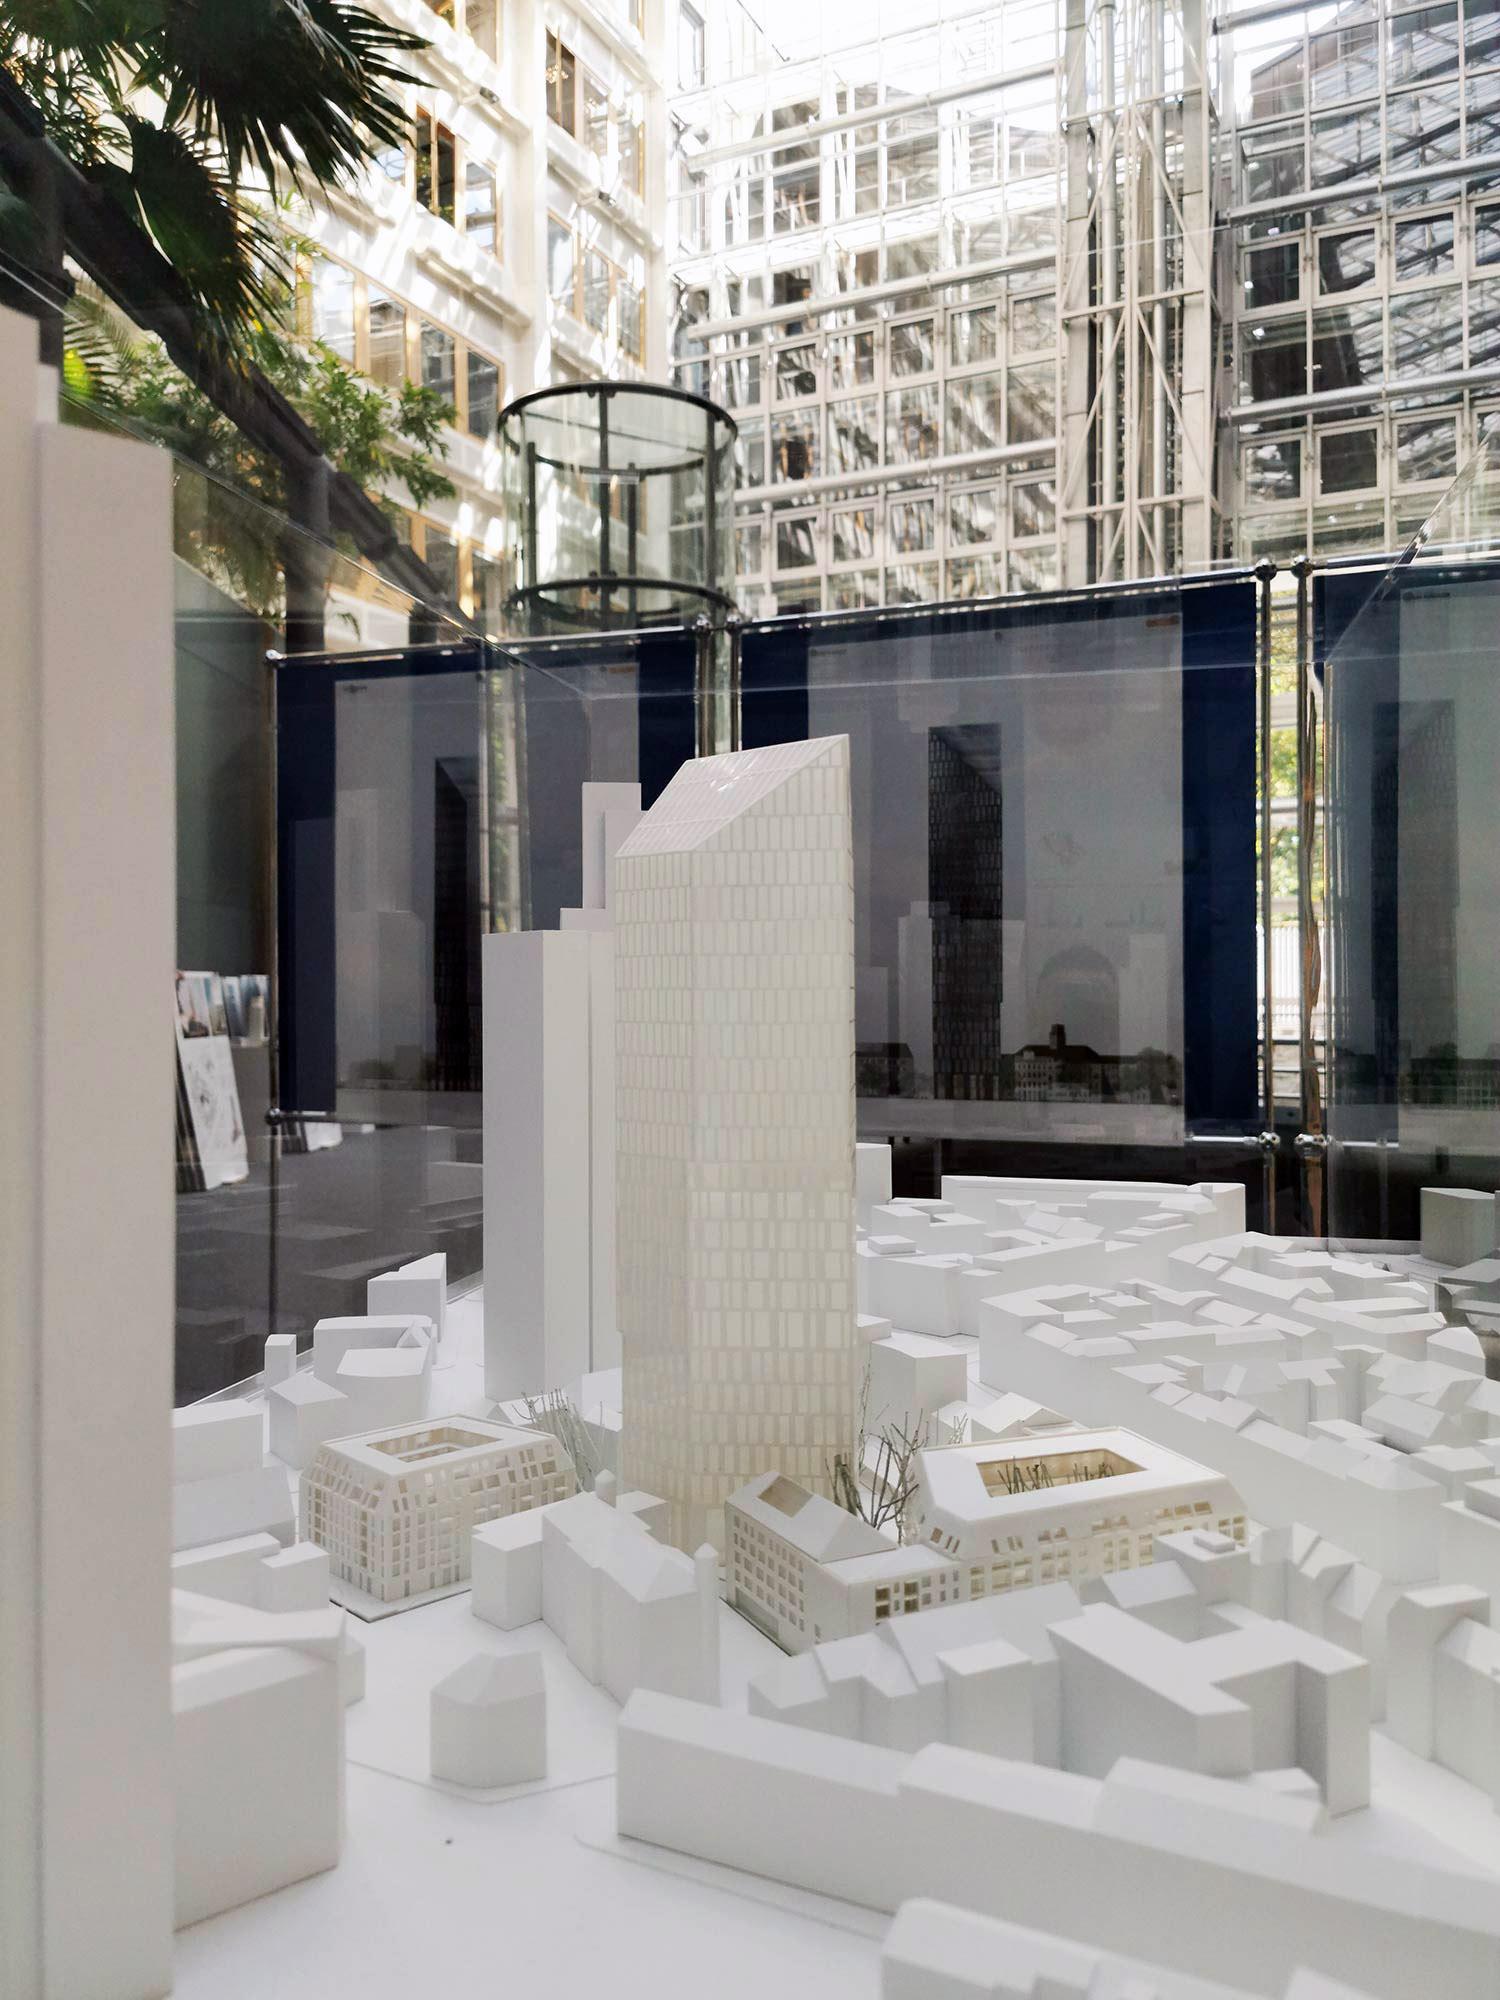 Das Prädium - Hochhausmodell Frankfurt